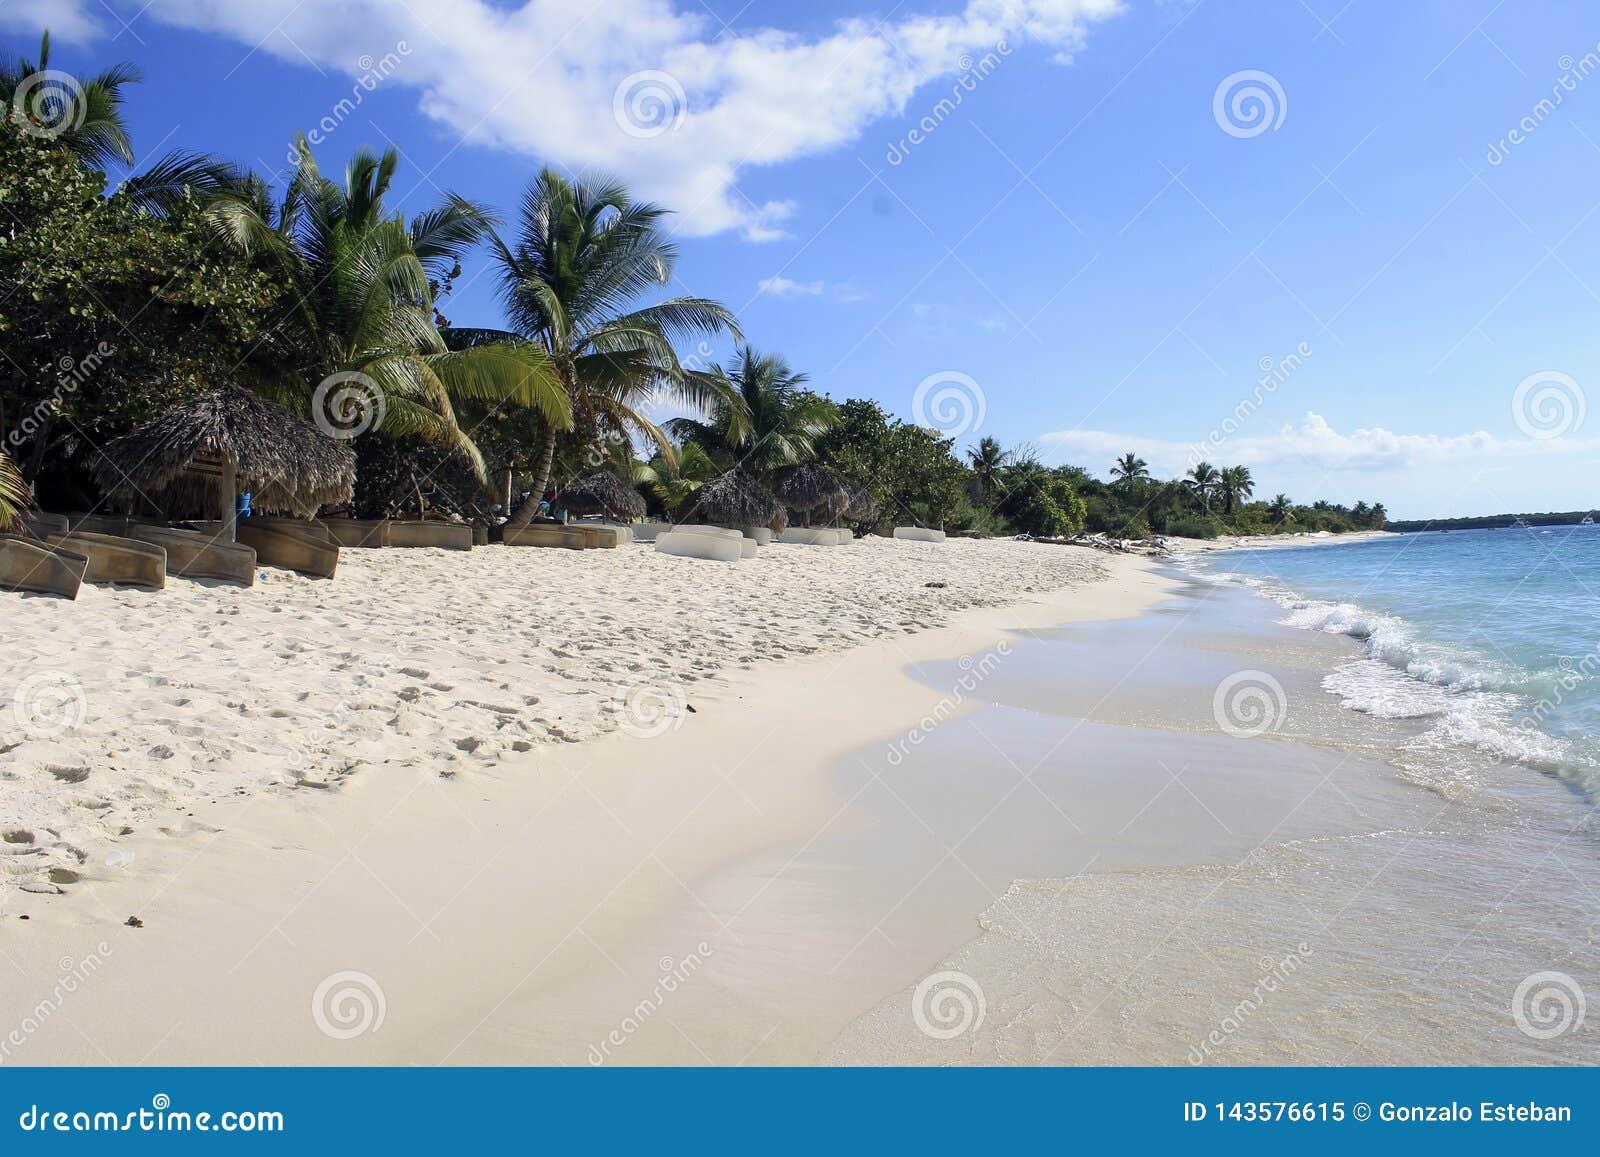 Tropisch eilandstrand met wit zand